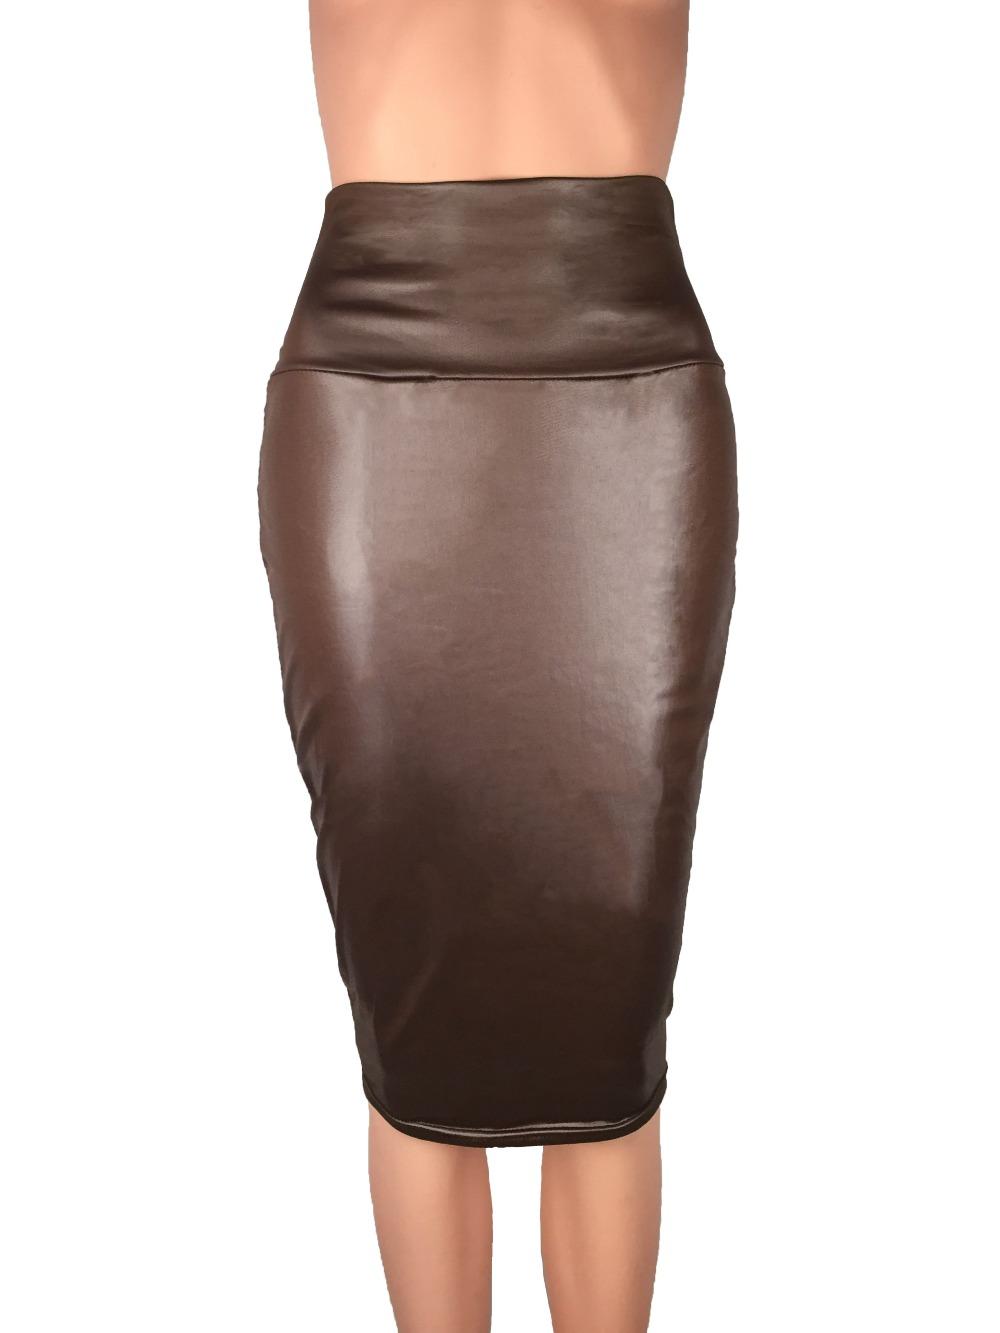 Bohocotol 19 pencil faux leather skirt women casual plus size clothing chic elegant sexy fitness black midi pencil skirts 2